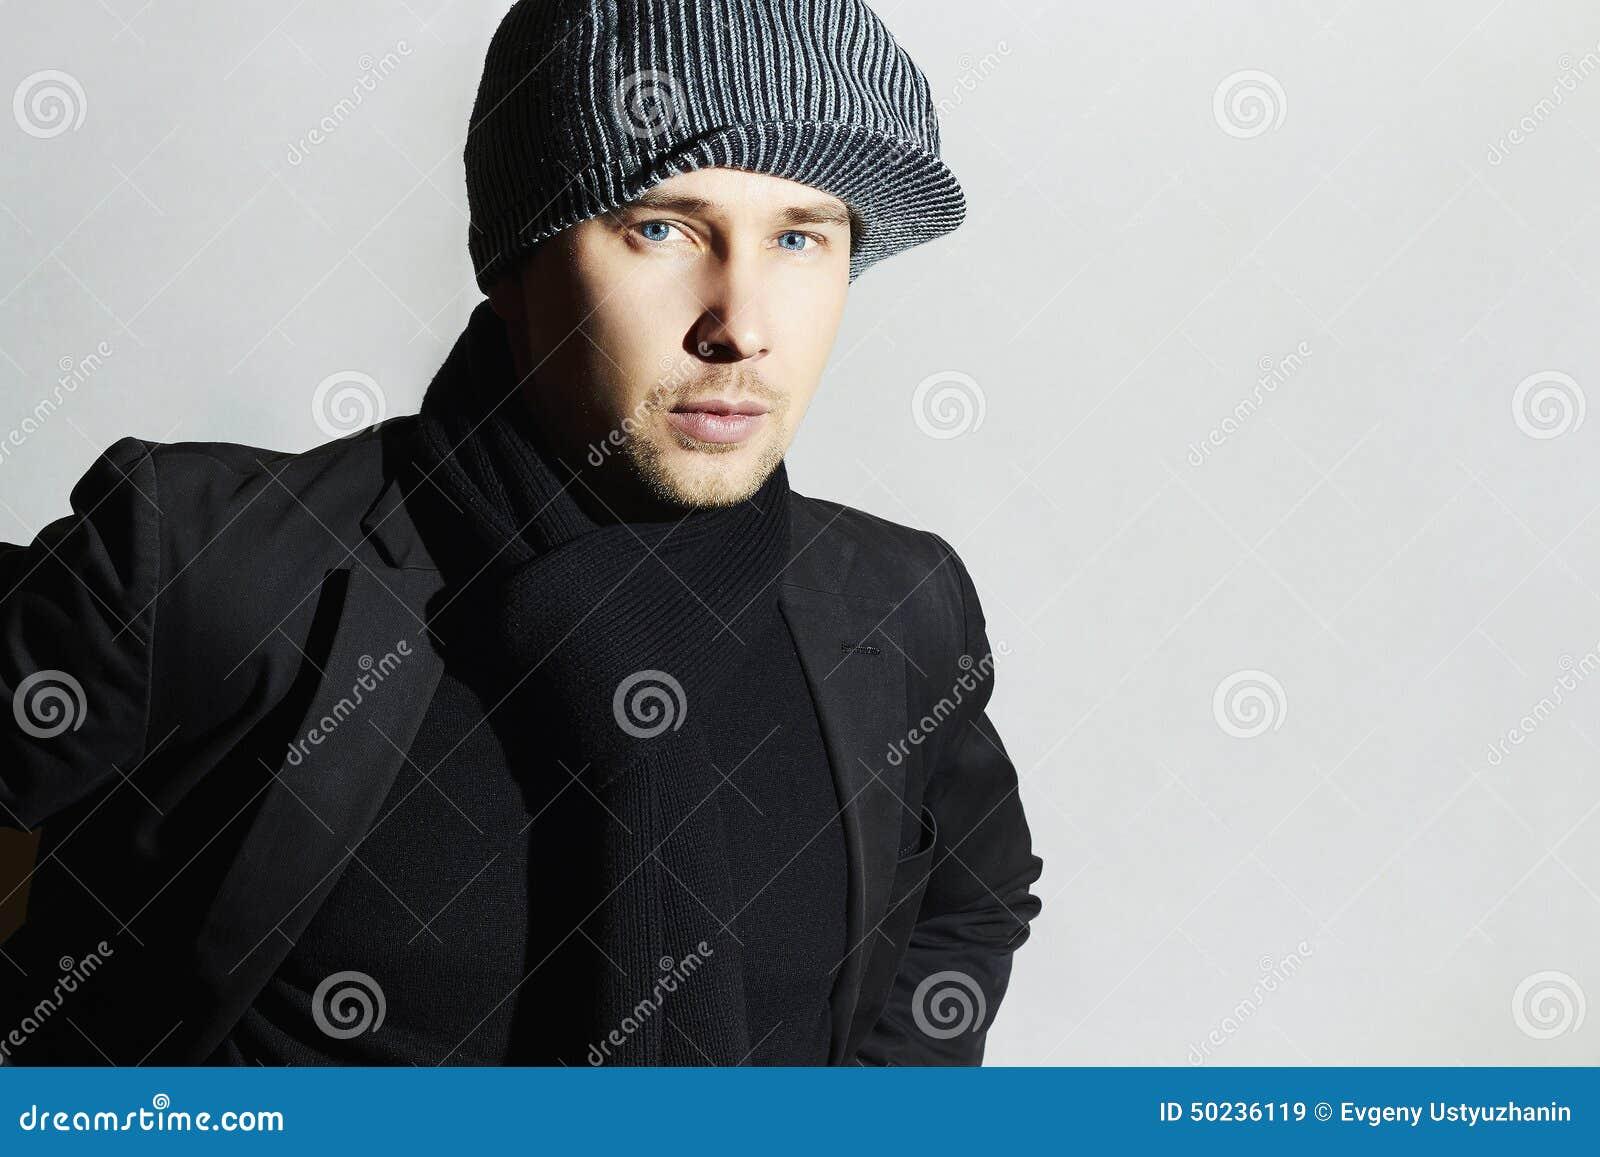 8b1b0e31a3f Fashionable Handsome Man in Black scarf.Stylish Boy in hat.Young man.spring  casual fashion